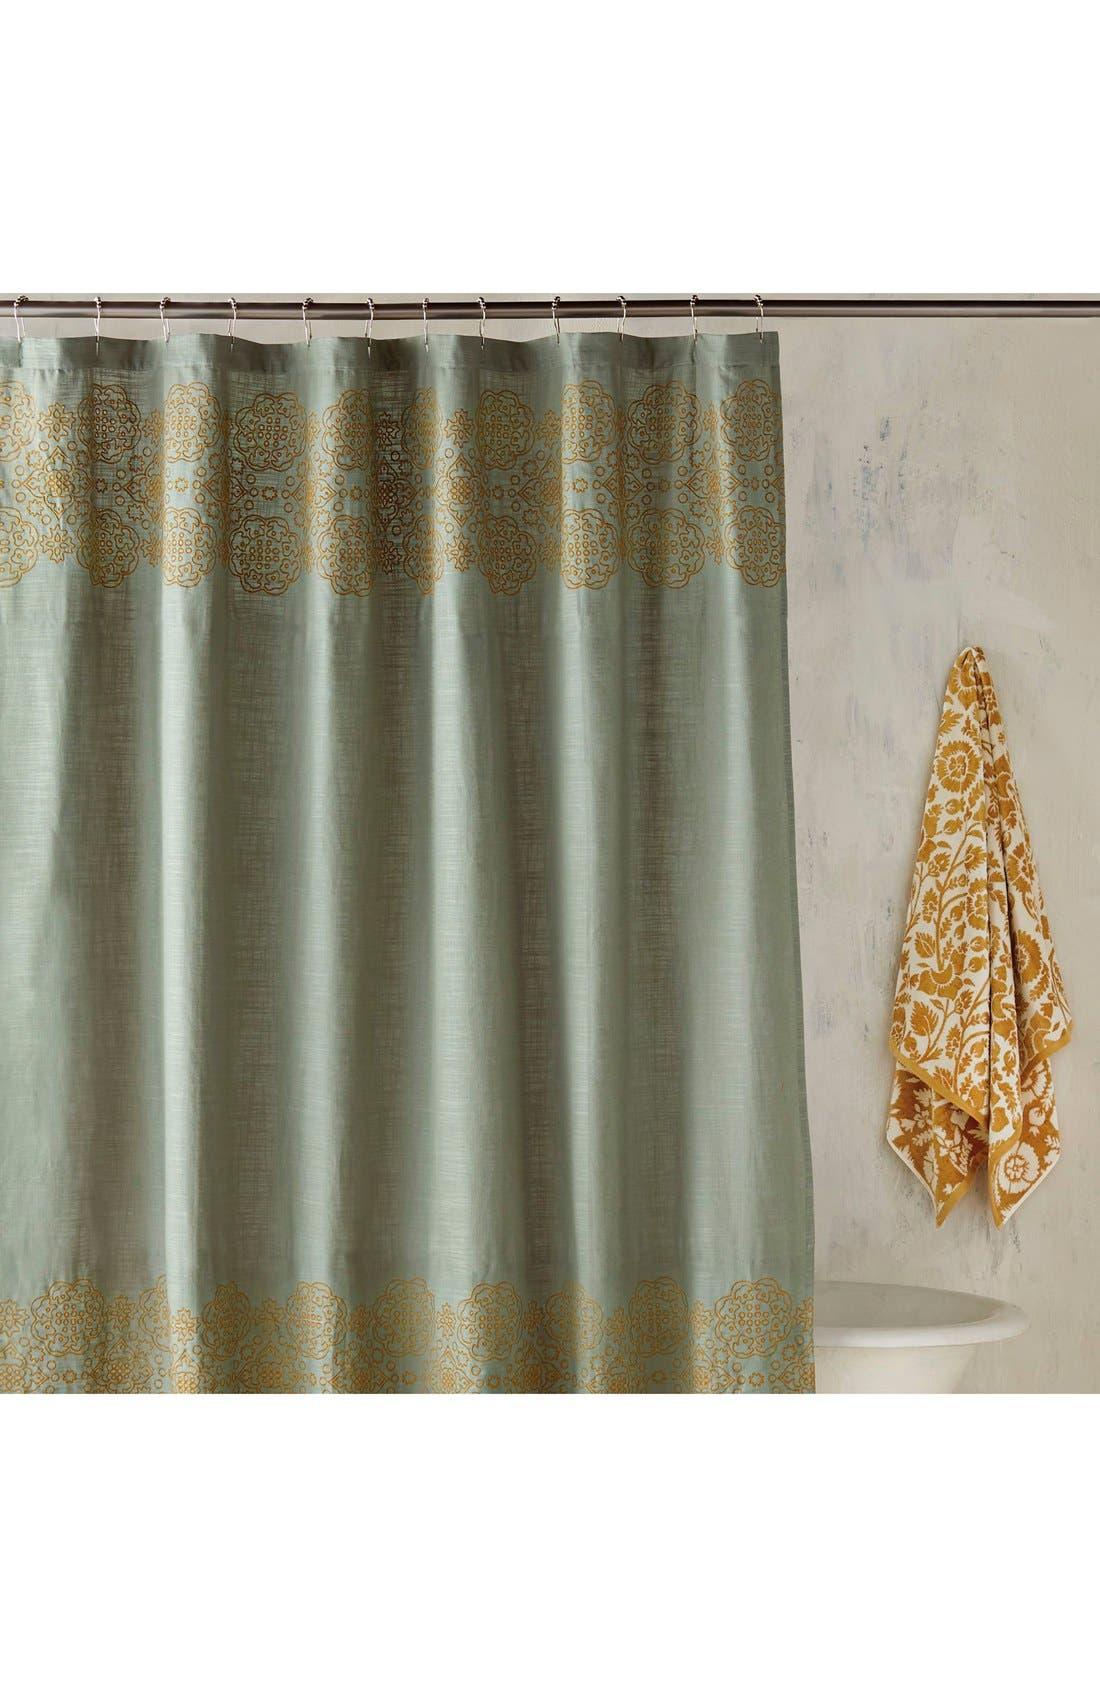 Alternate Image 1 Selected - John Robshaw 'Ajrak' Shower Curtain